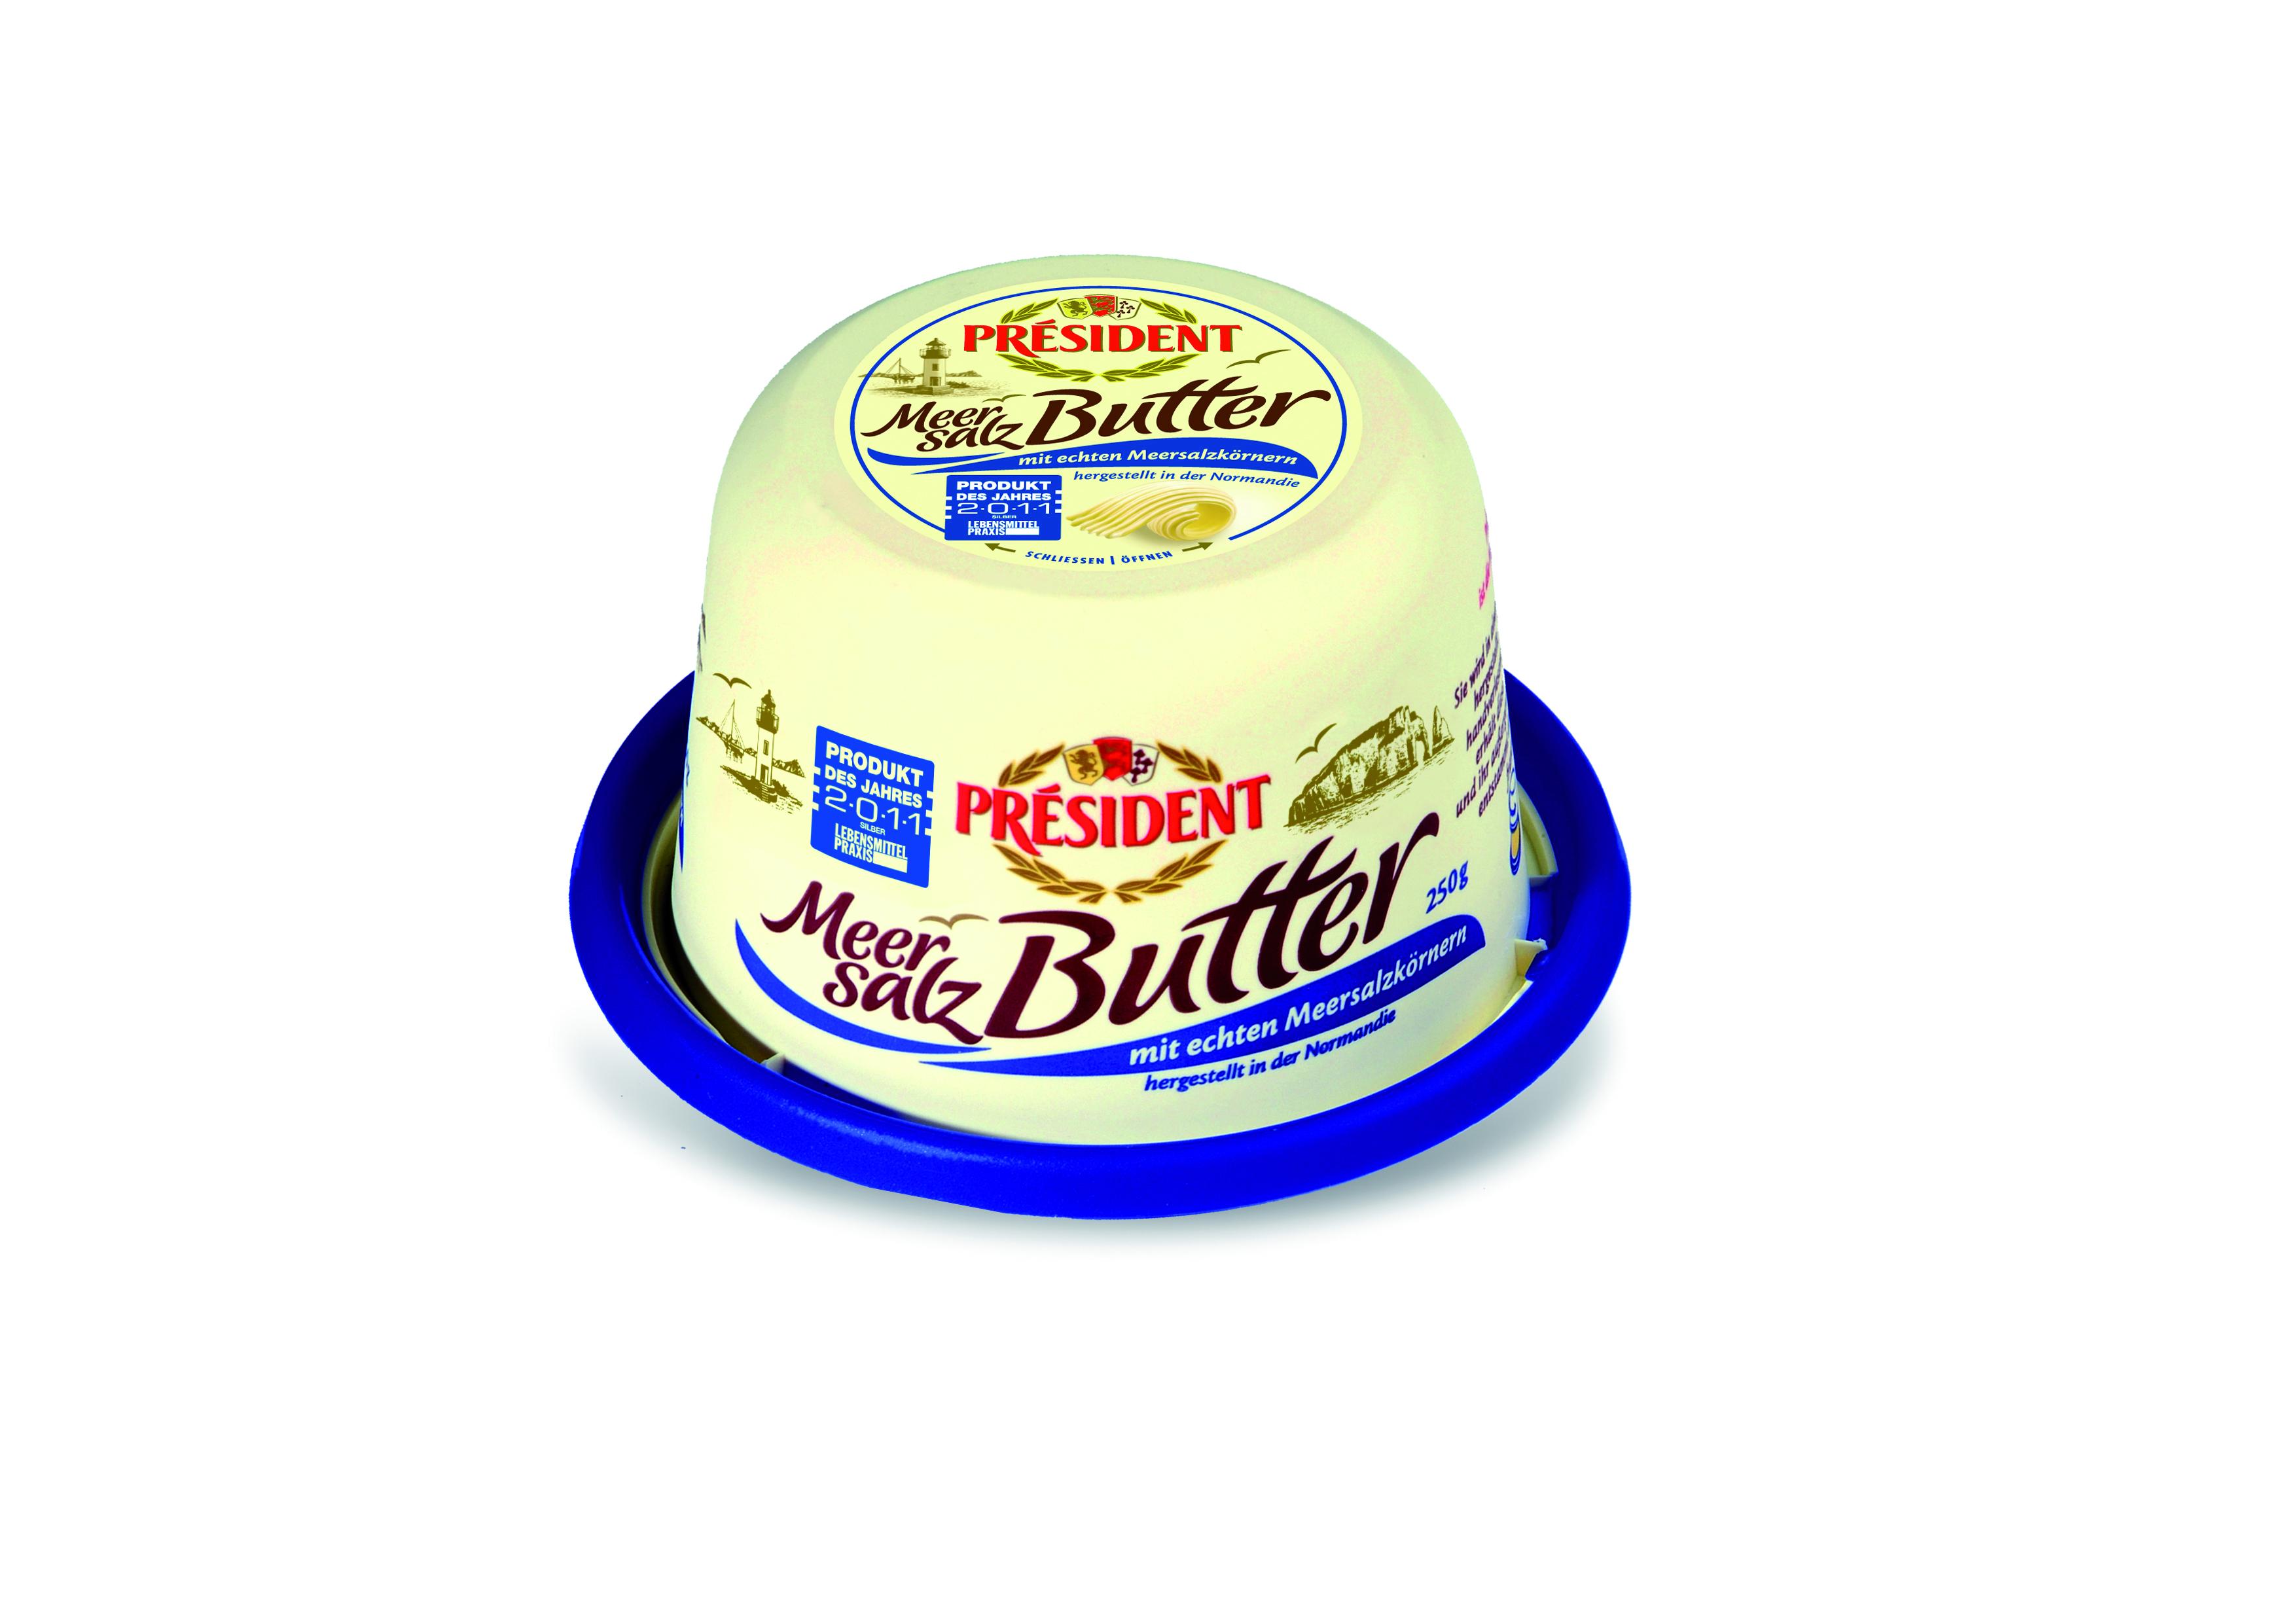 pr sident meersalz butter 250g 250 gramm lactalis deutschland gmbh butter butterersatz. Black Bedroom Furniture Sets. Home Design Ideas